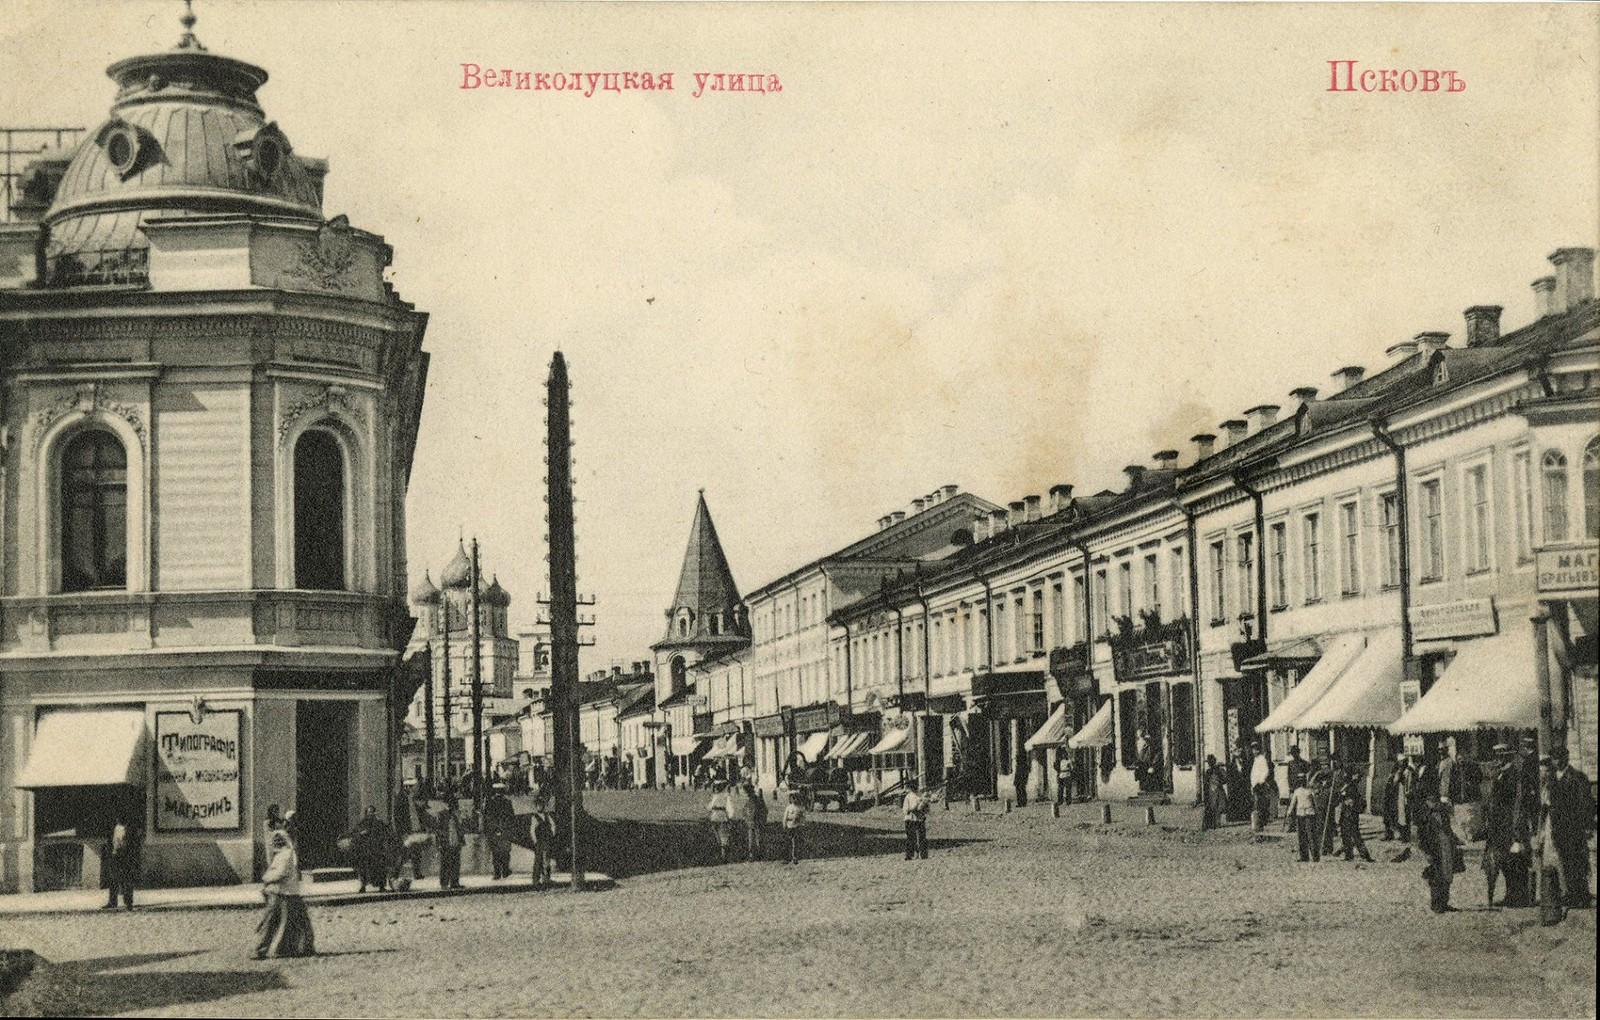 Великолуцкая улица.